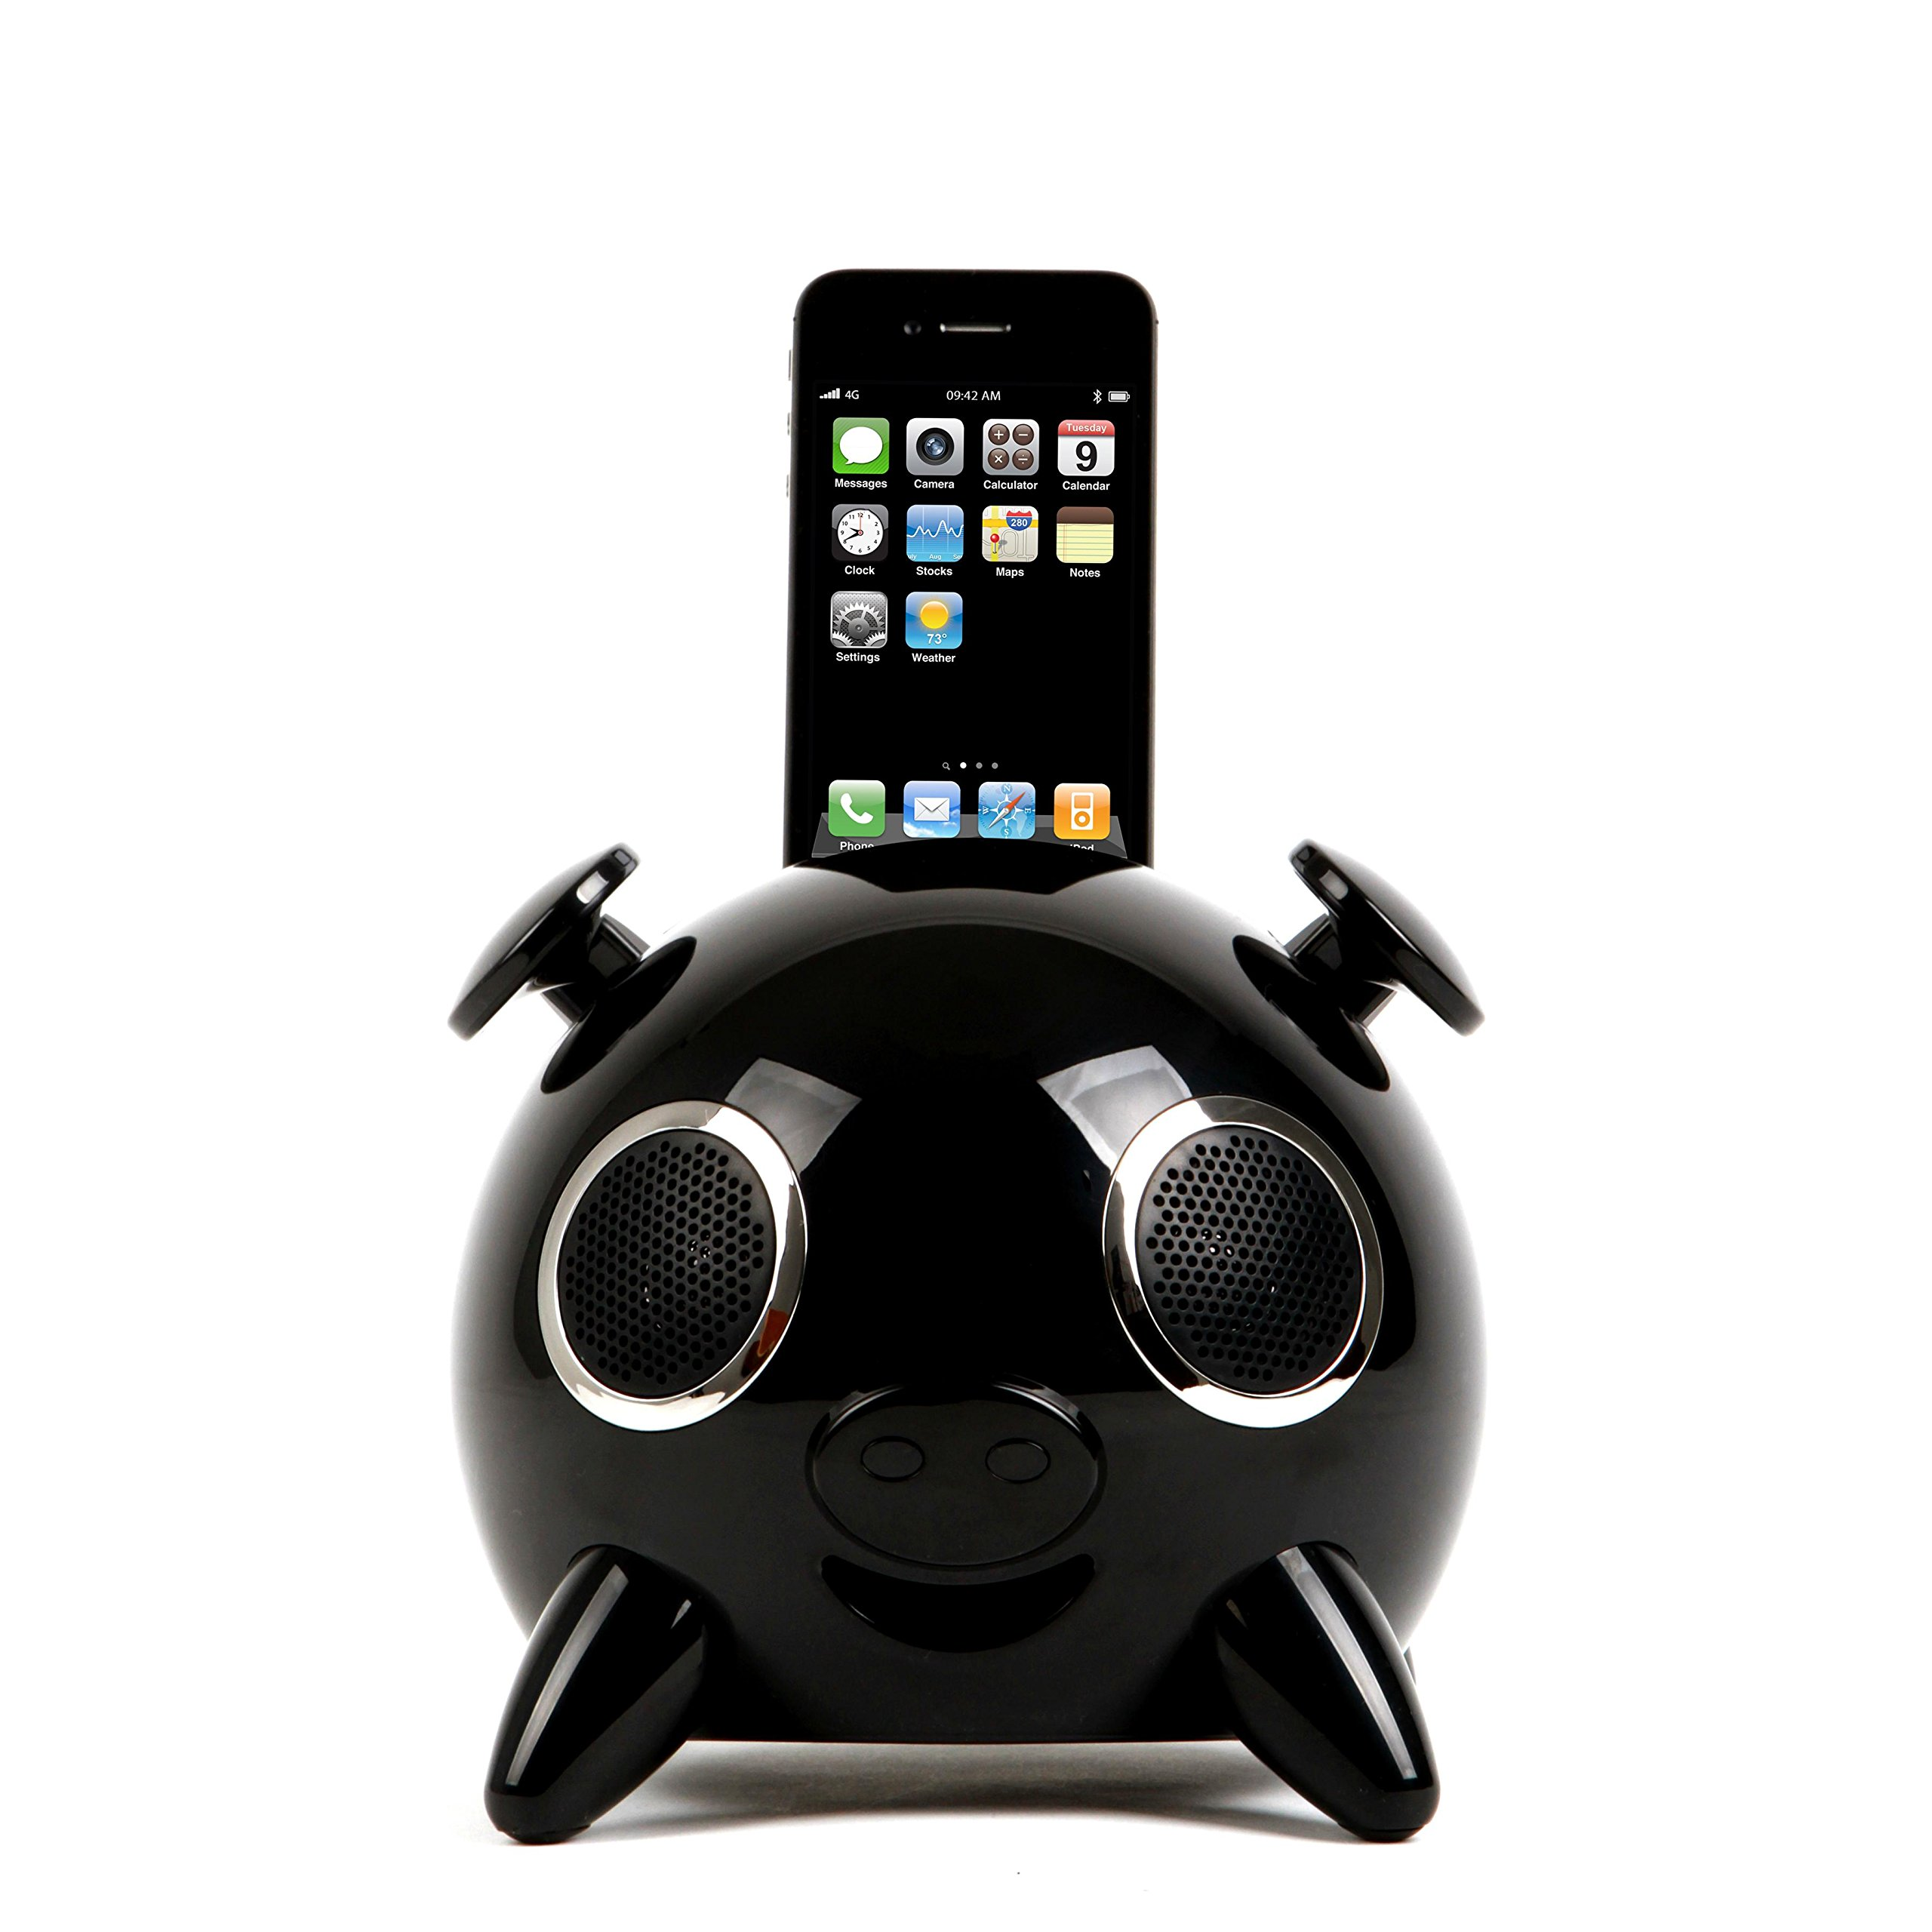 Amethyst Innovations AIP0120BK Docking Pig Speaker, Black